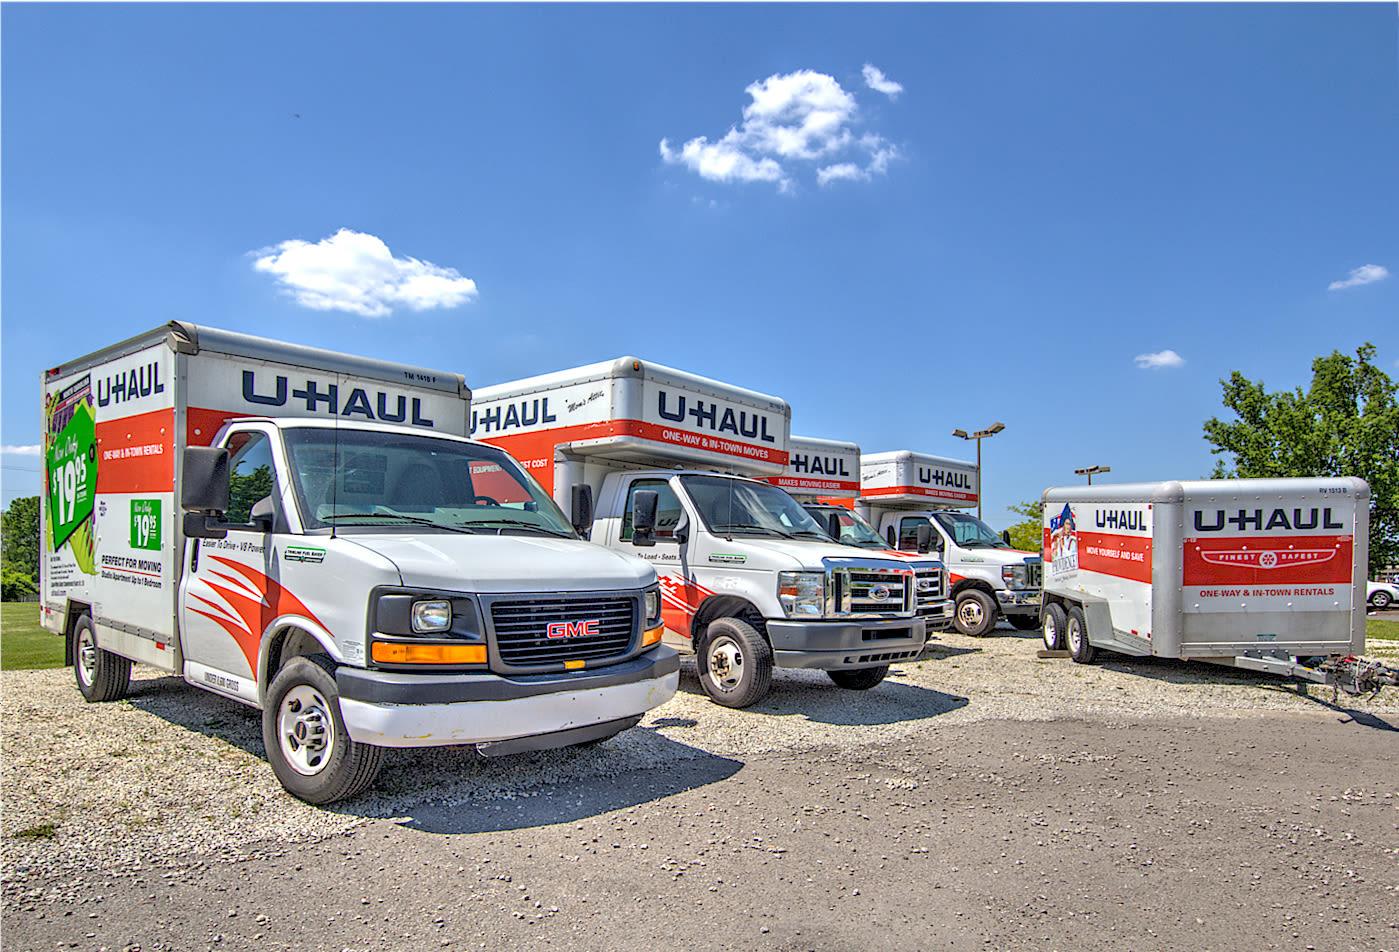 Rental trucks at  Prime Storage in Louisville, Kentucky